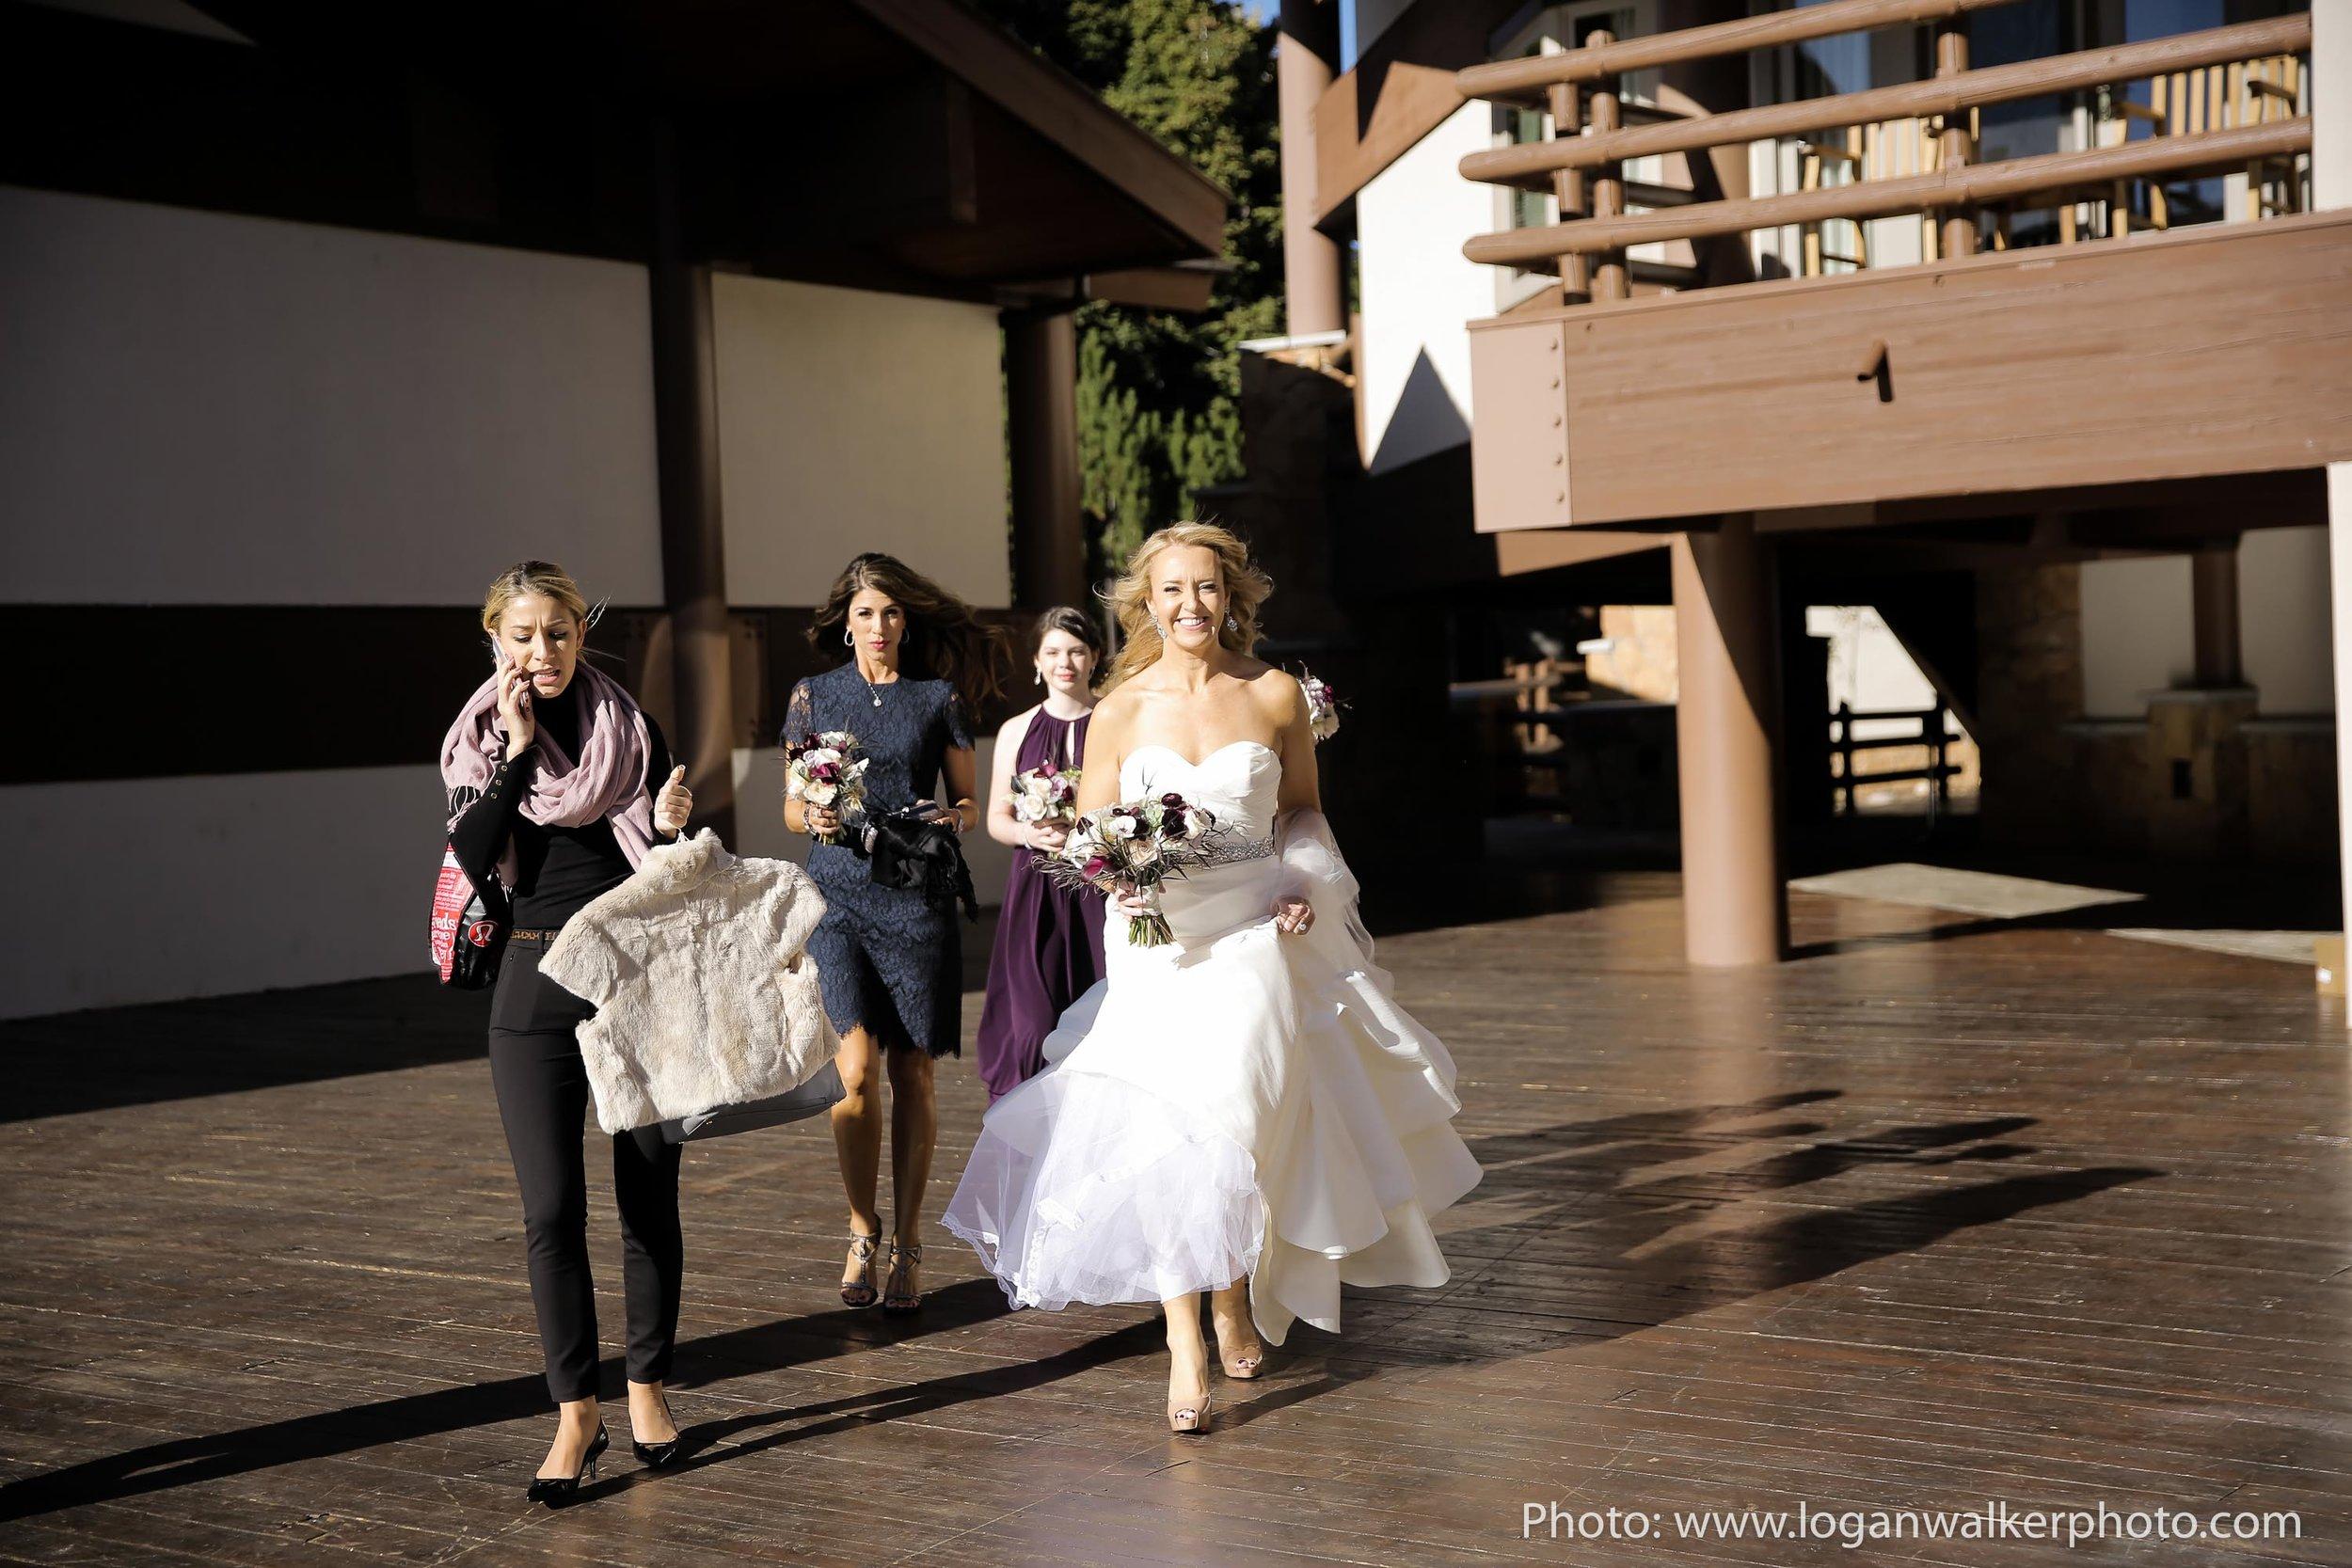 Fall Weddings Park City Stein Eriksen Lodge-0264.jpg